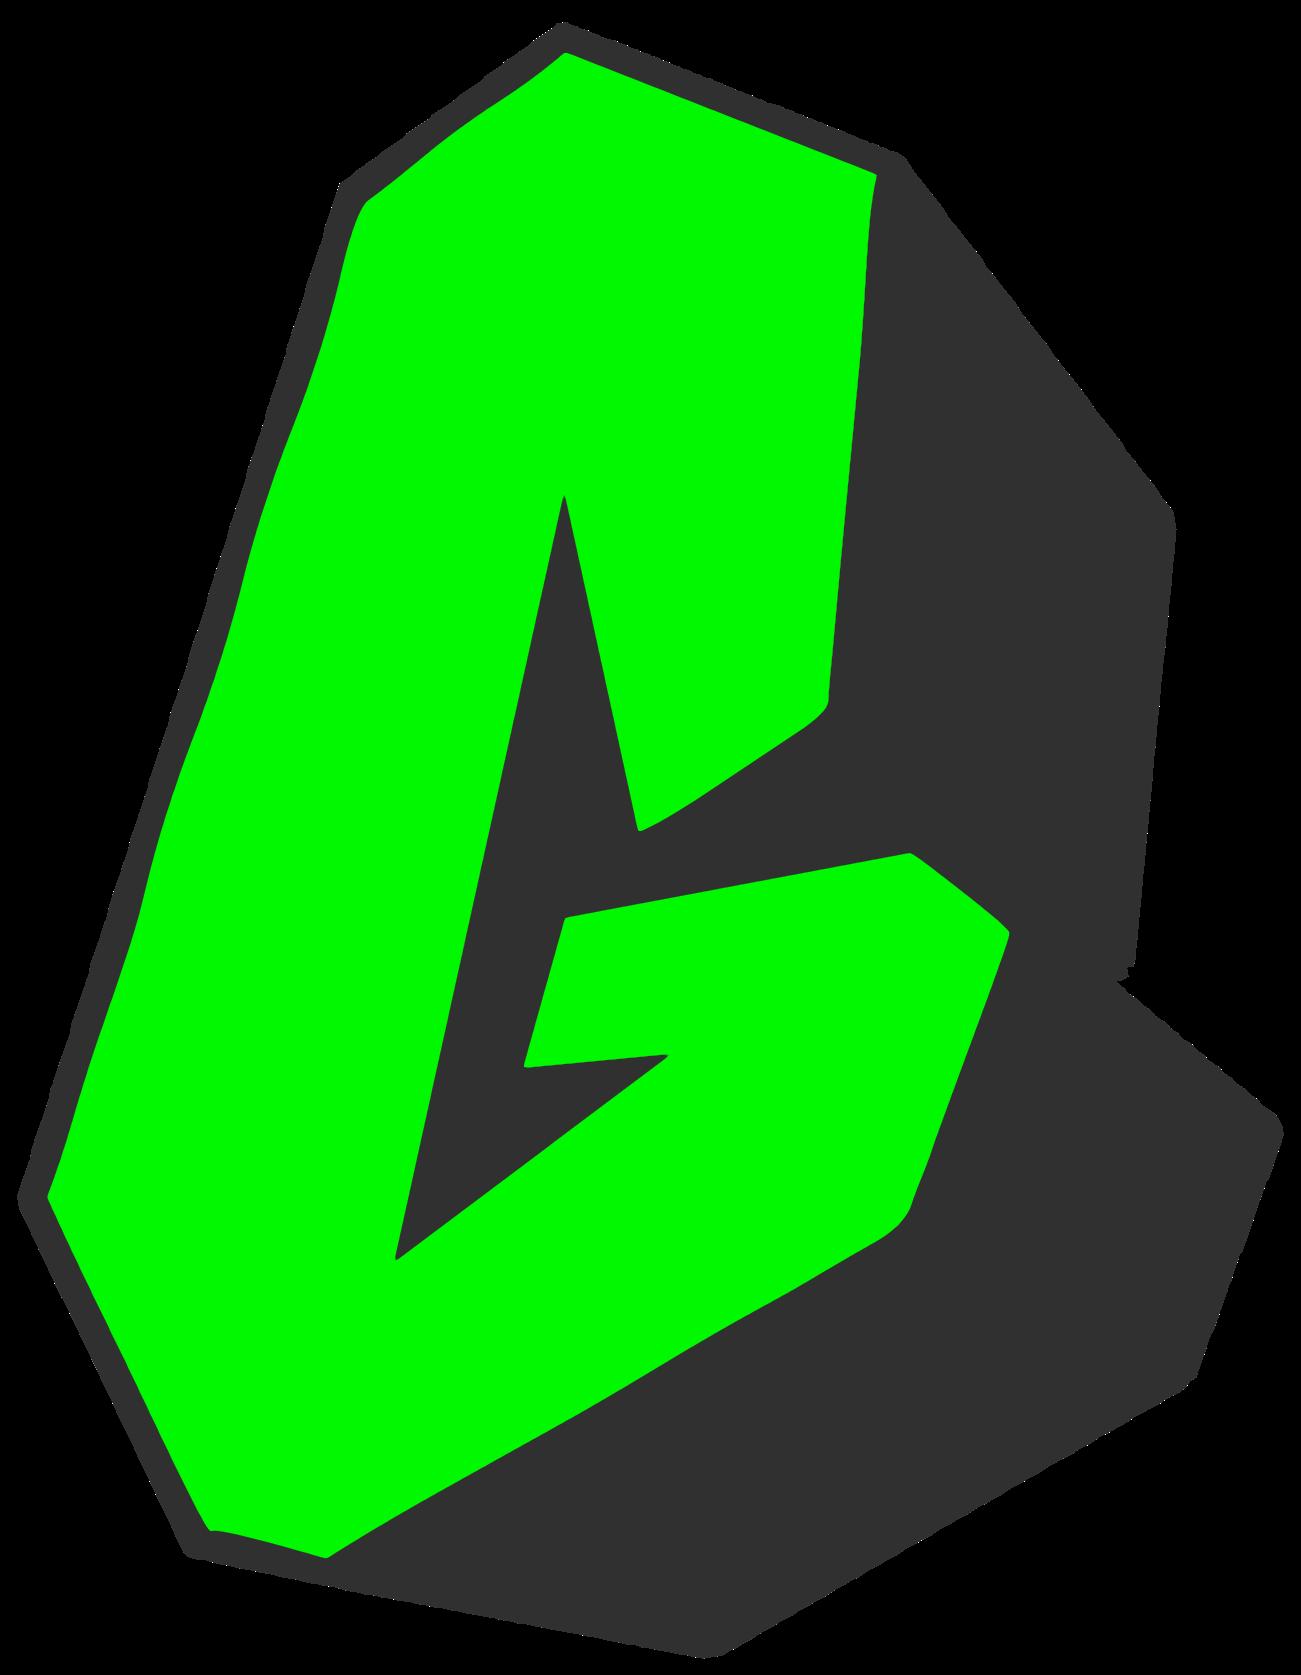 G (light lead:green).png